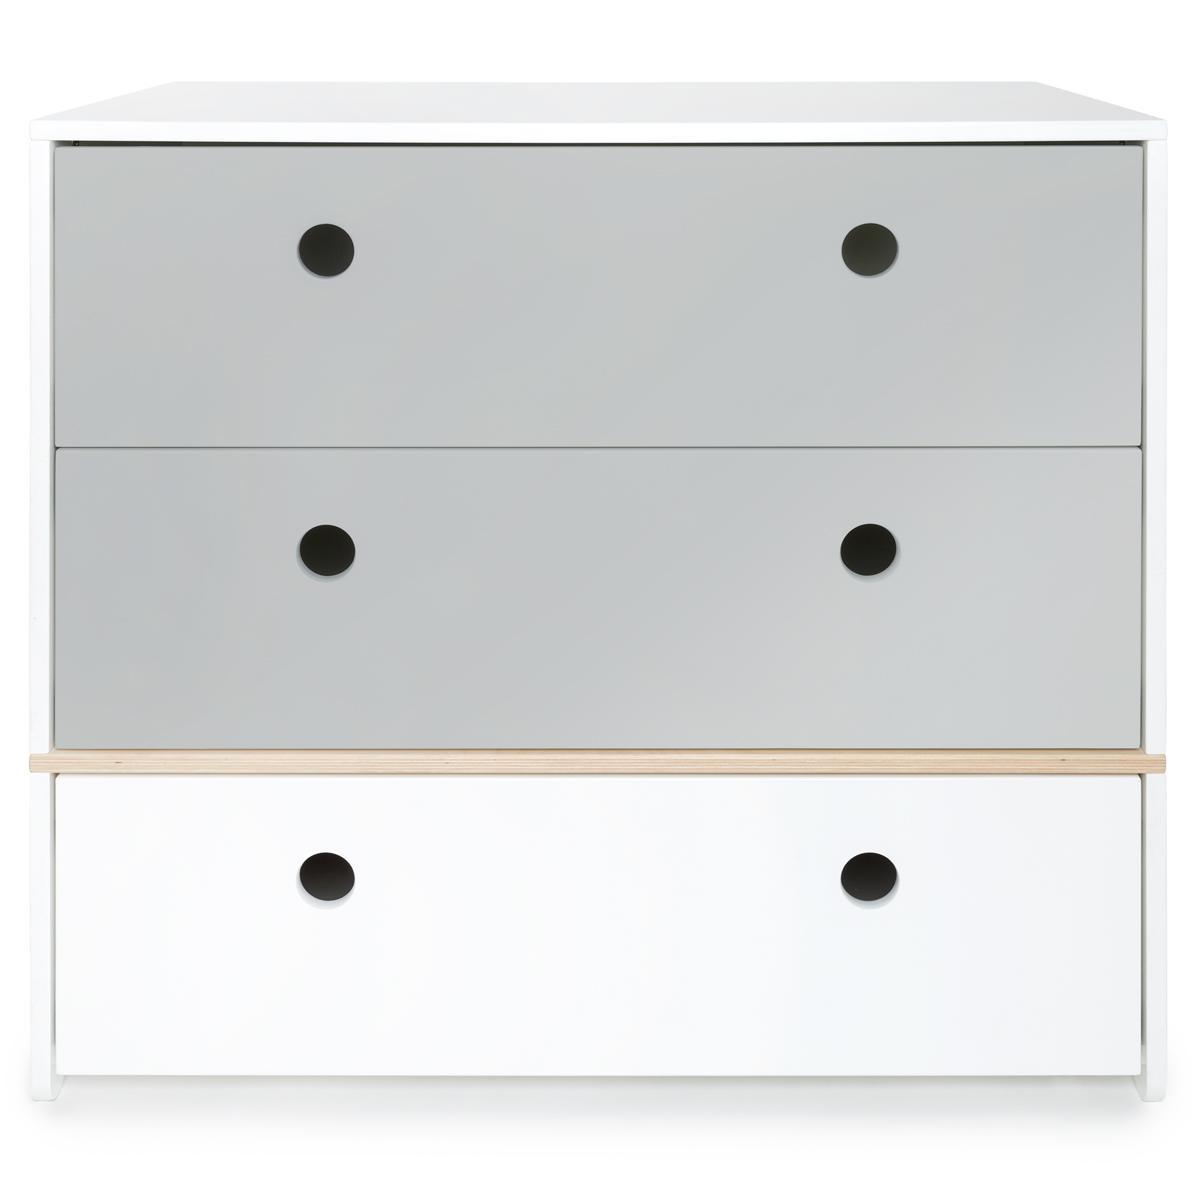 Kommode COLORFLEX Schubladen Farben pearl grey-pearl grey-white